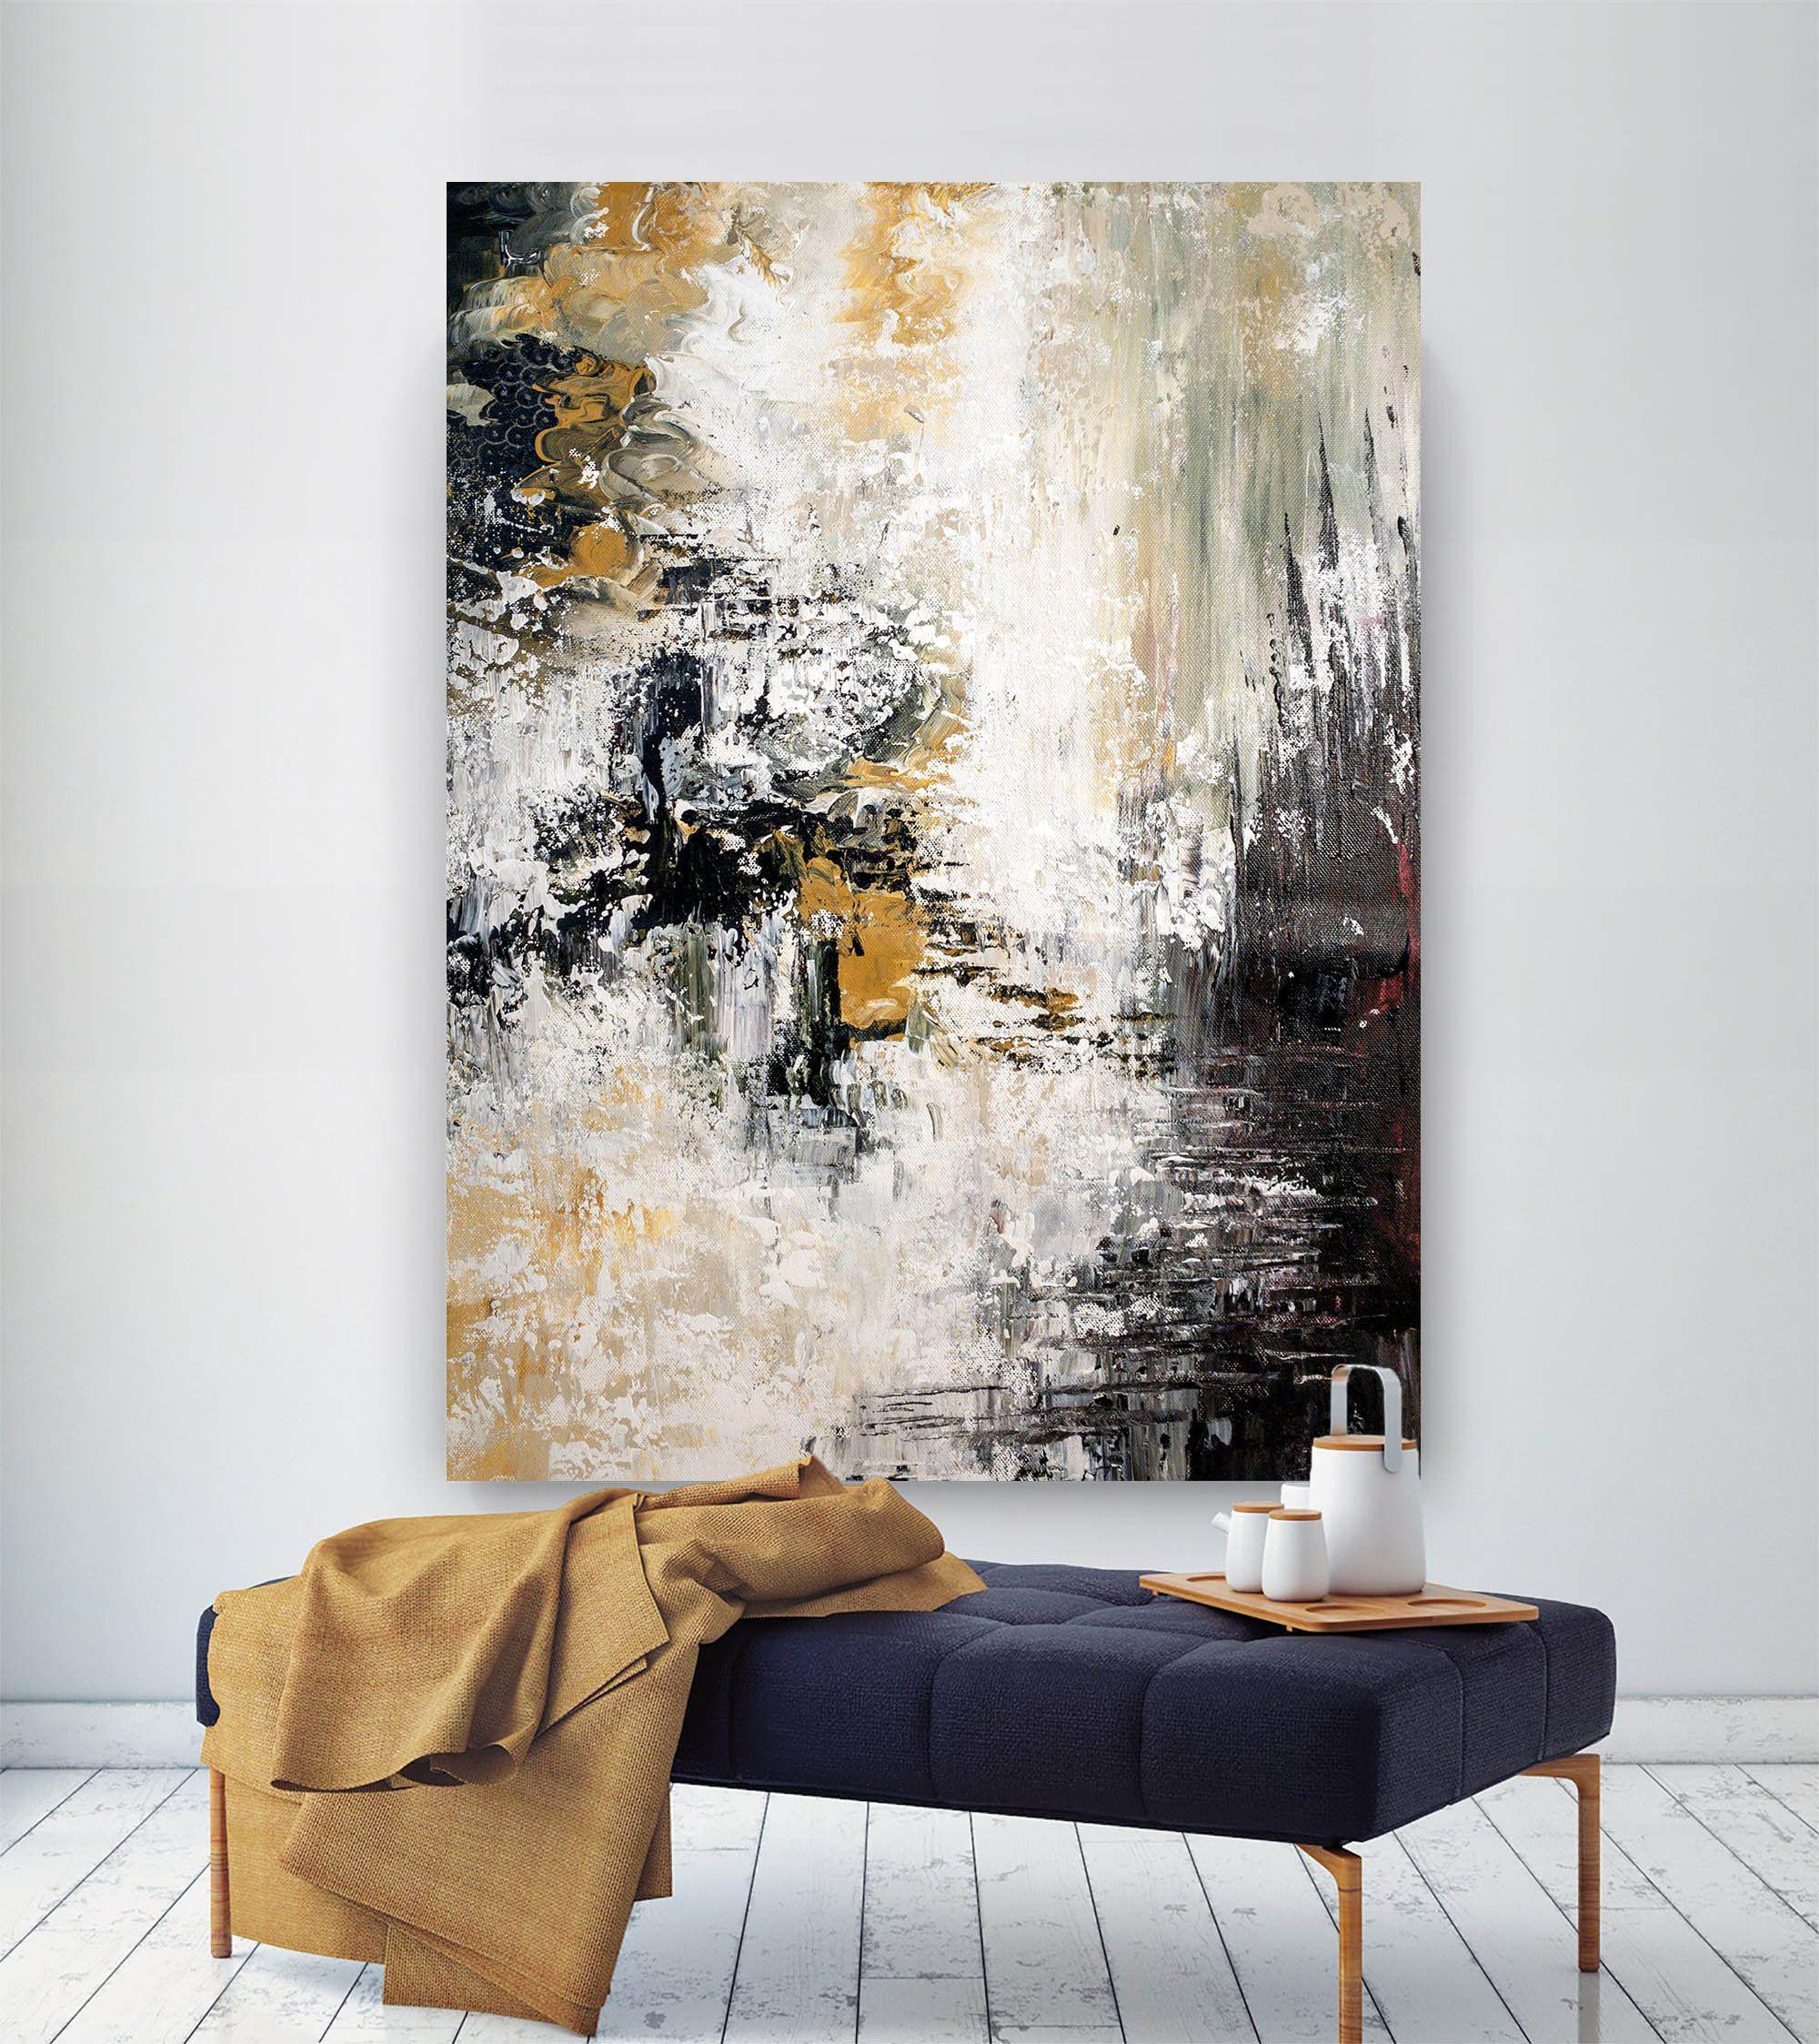 Large Modern Wall Art Paintinglarge Abstract Painting On Etsy In 2020 Large Abstract Wall Art Large Wall Art Extra Large Wall Art